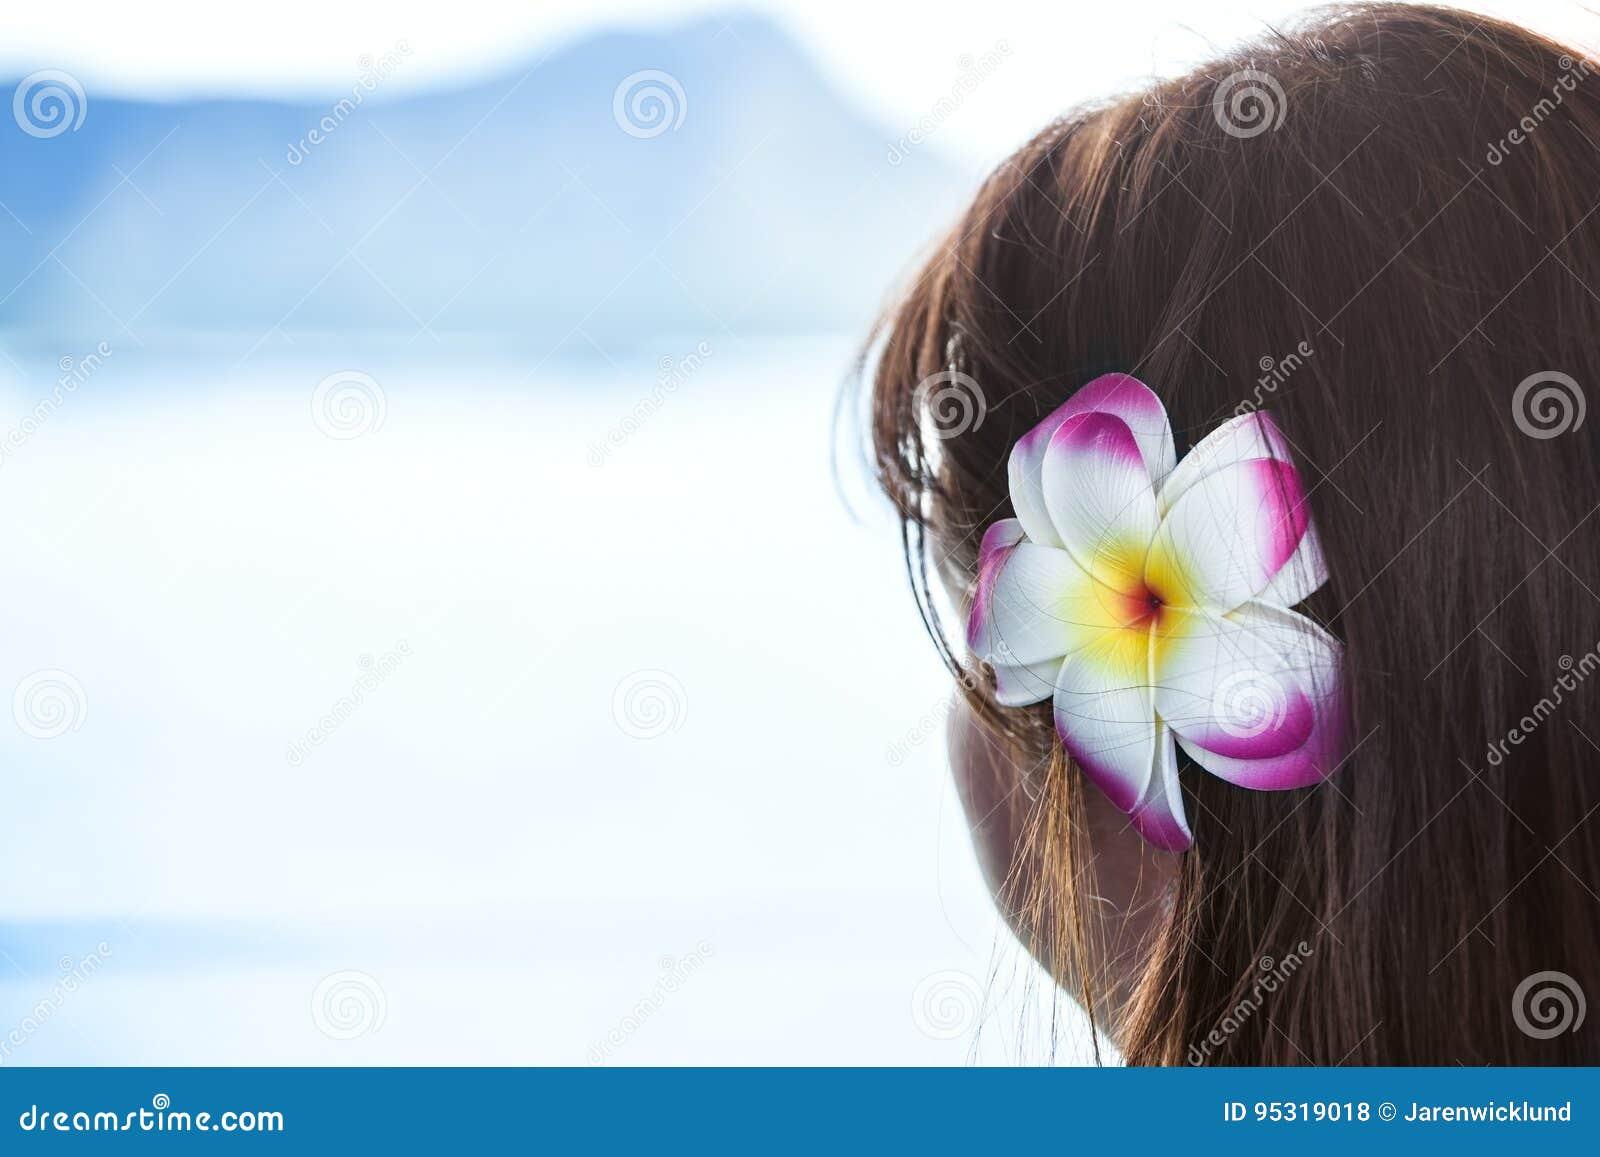 Dark haired girl wearing hawaiian flower looking at ocean view stock download dark haired girl wearing hawaiian flower looking at ocean view stock photo image of izmirmasajfo